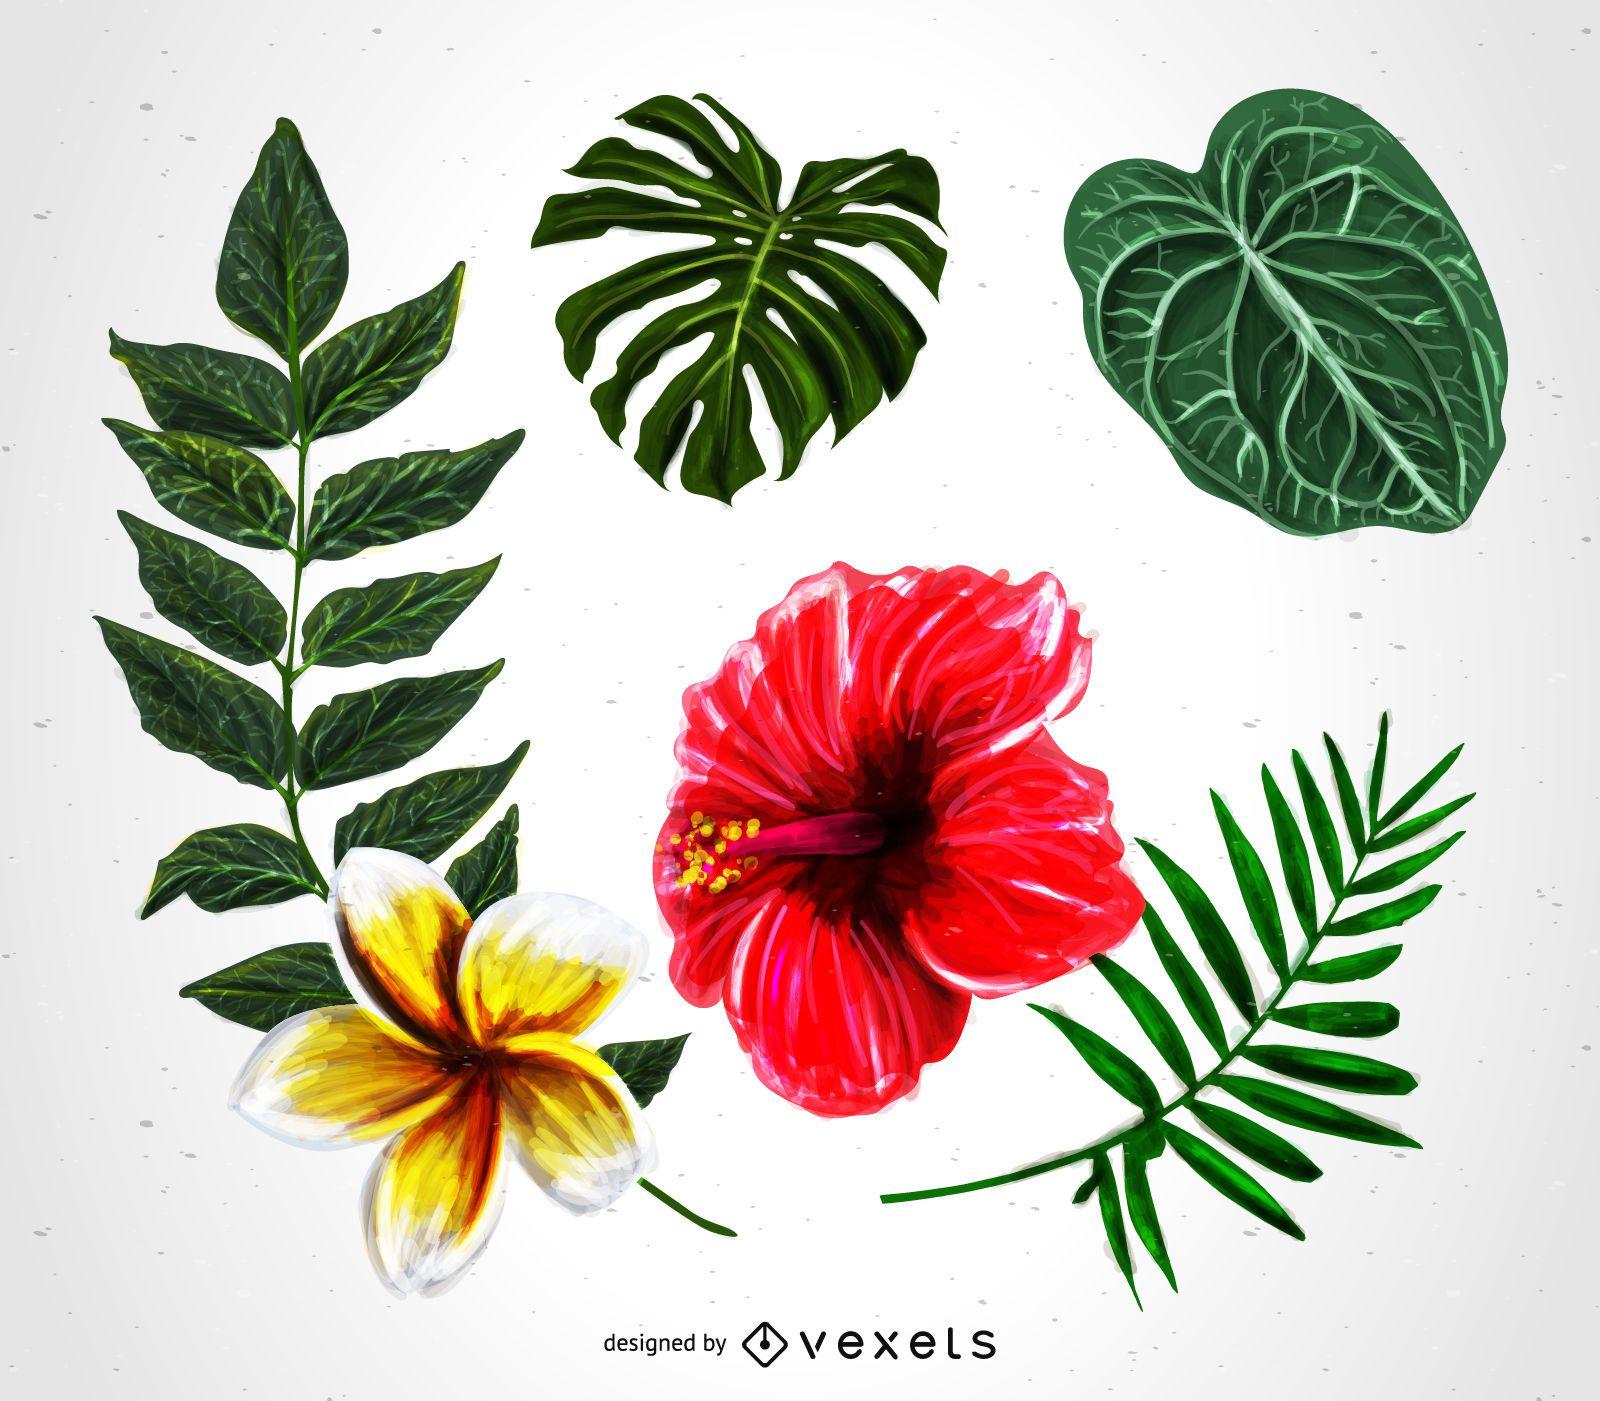 Tropical plants illustration set